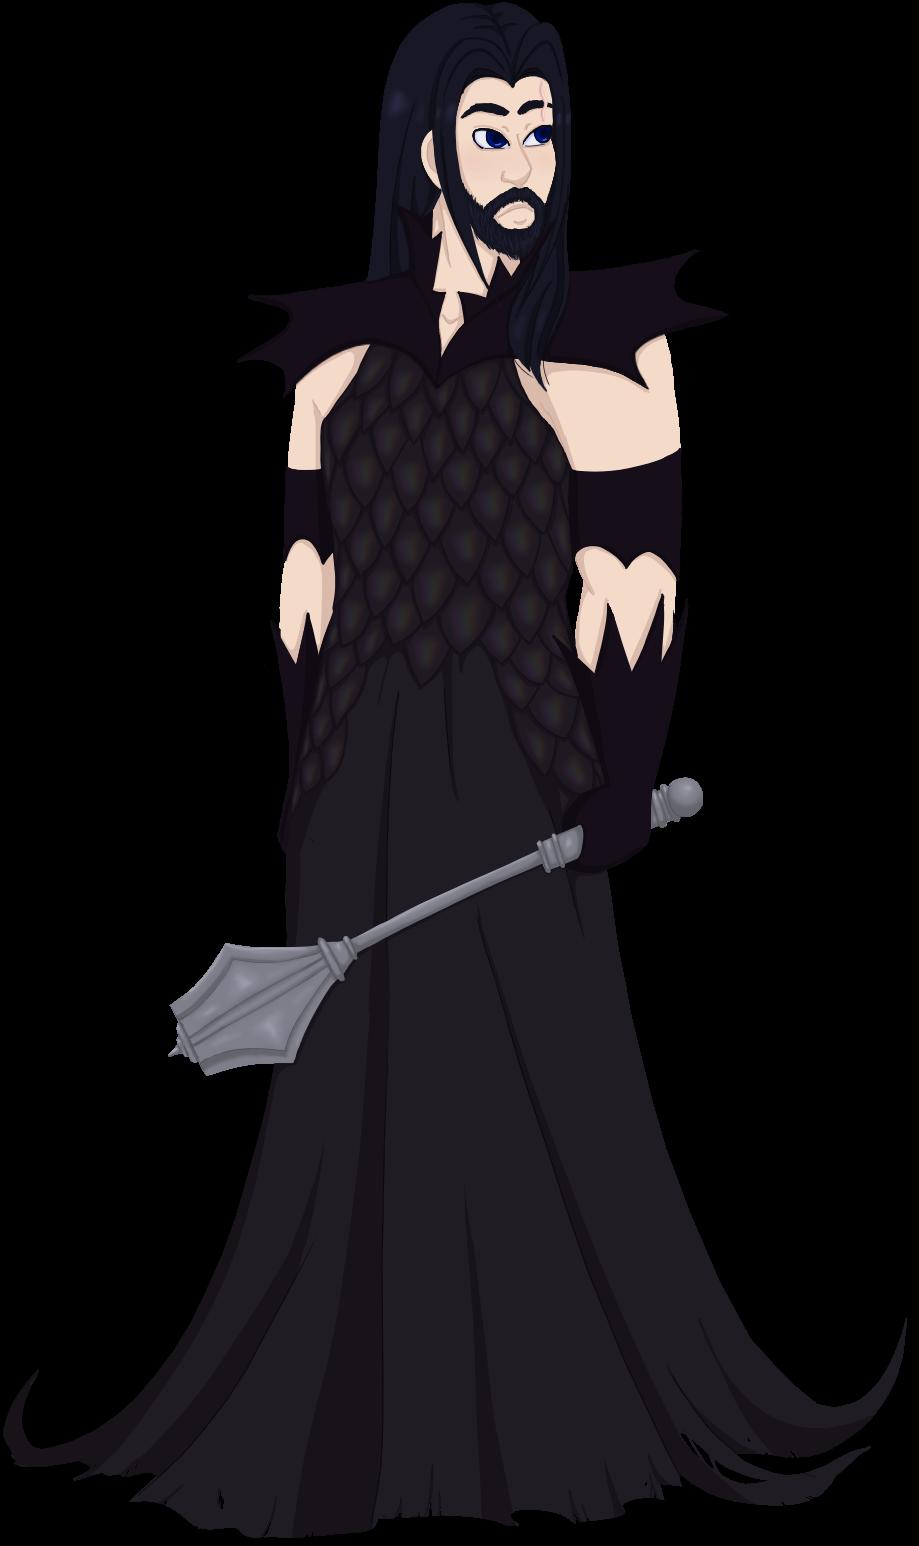 Dark Cleric by faerie-daze